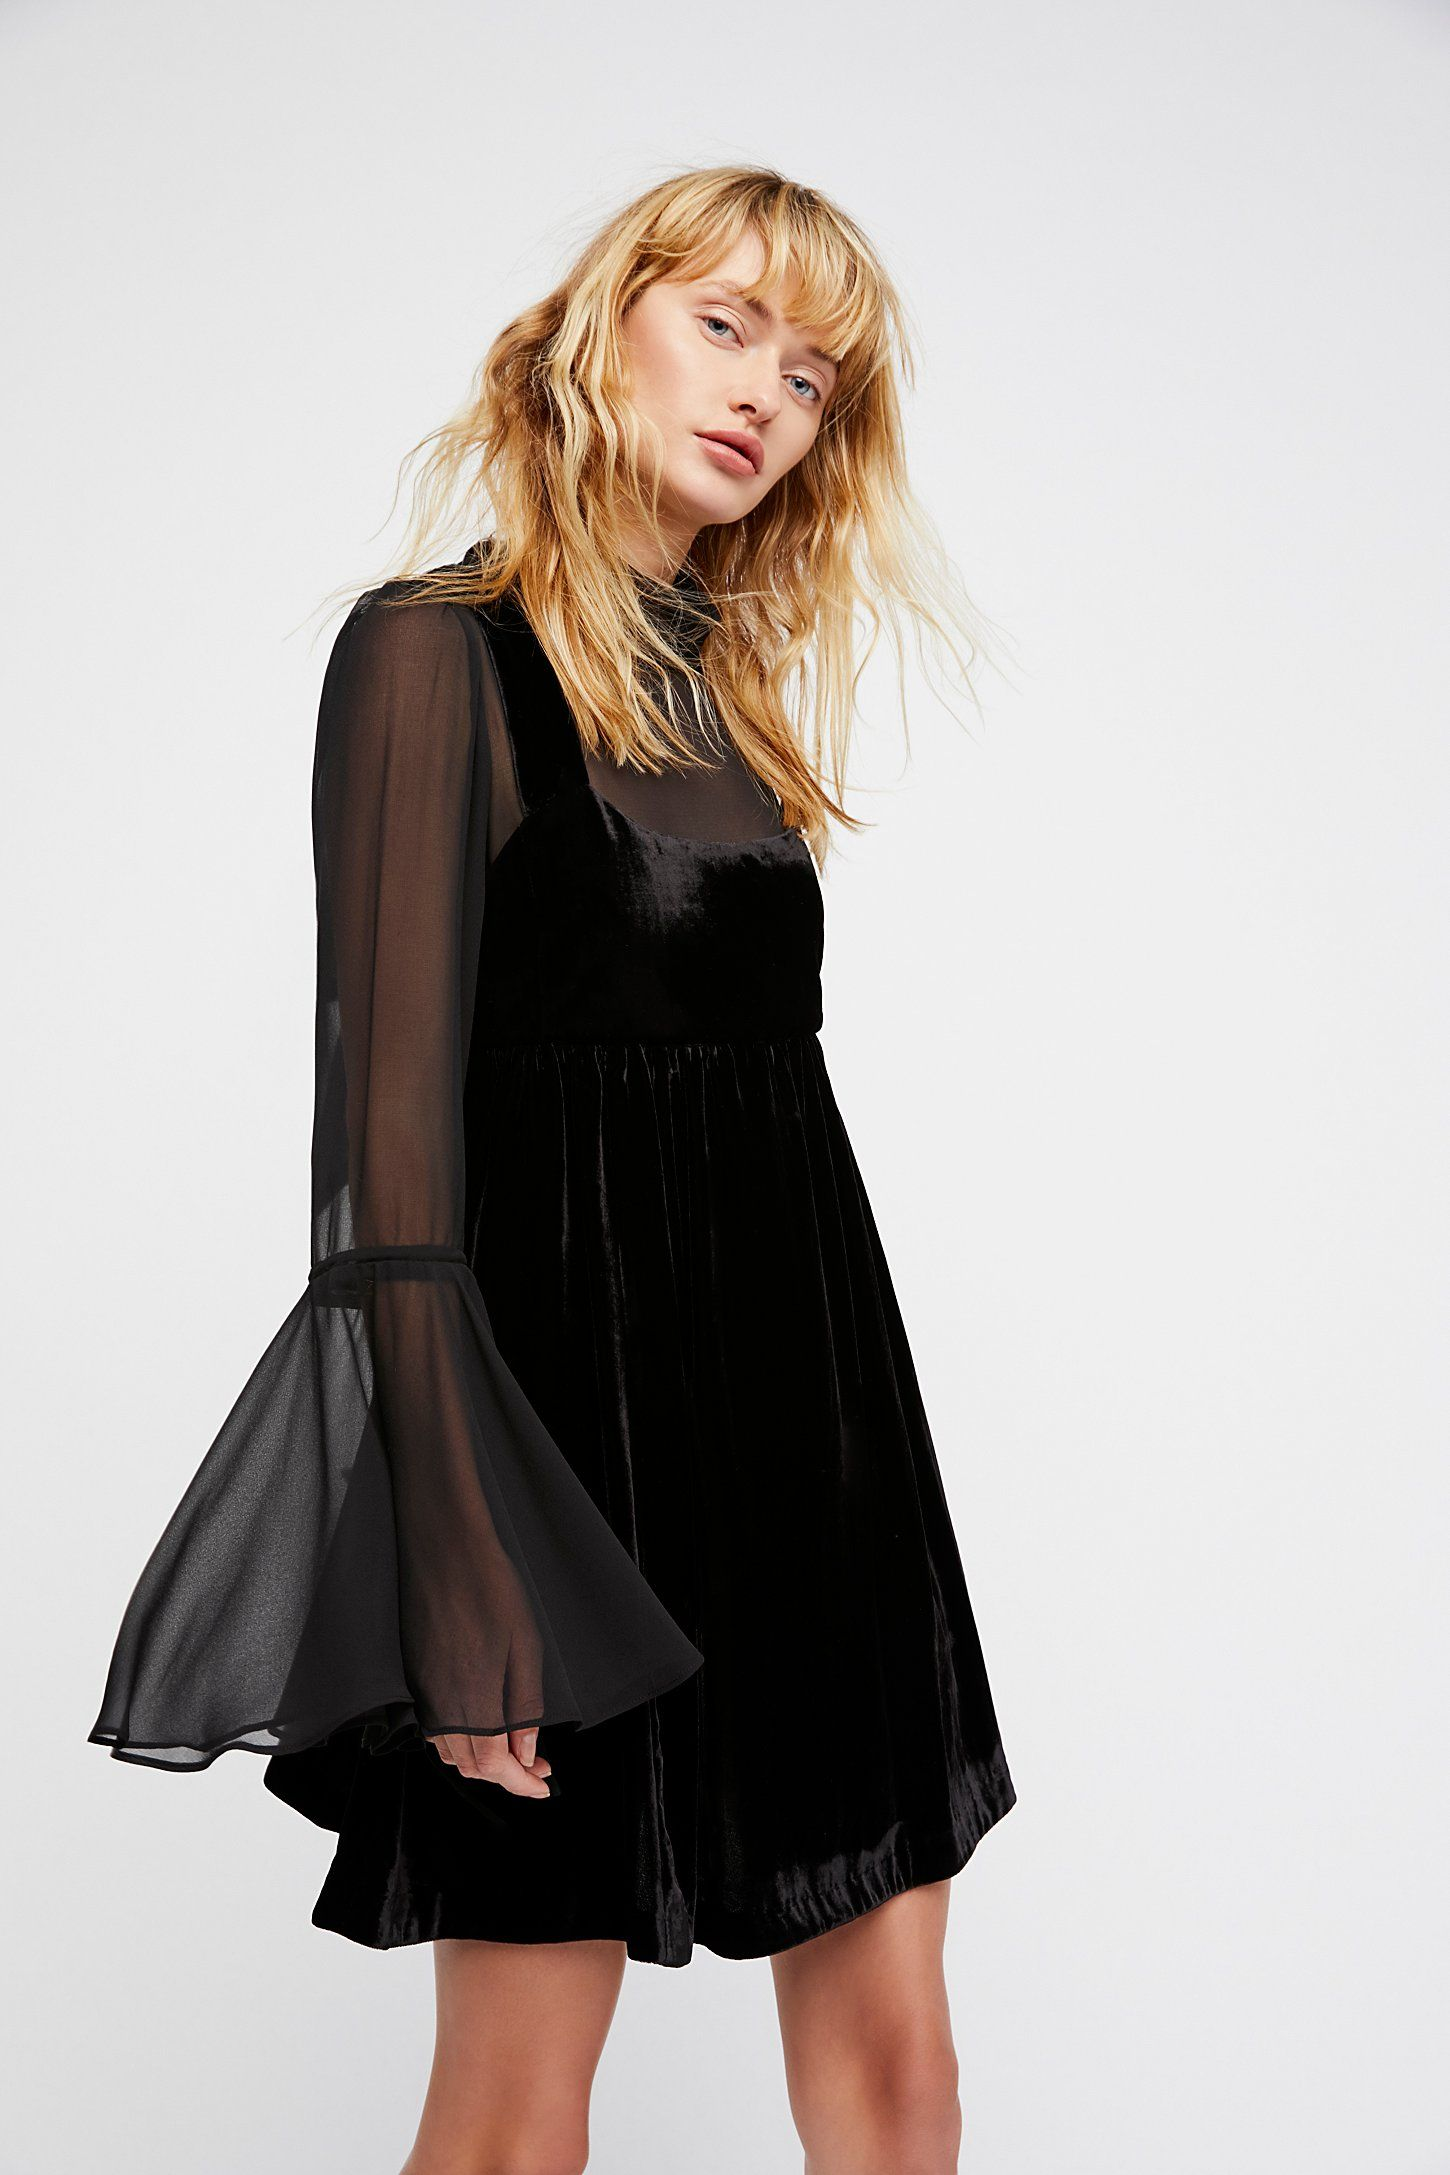 Big Sale Big Discount Counting Stars Mini Dress - Black Free People Explore Cheap Sale Prices ZREZVijS